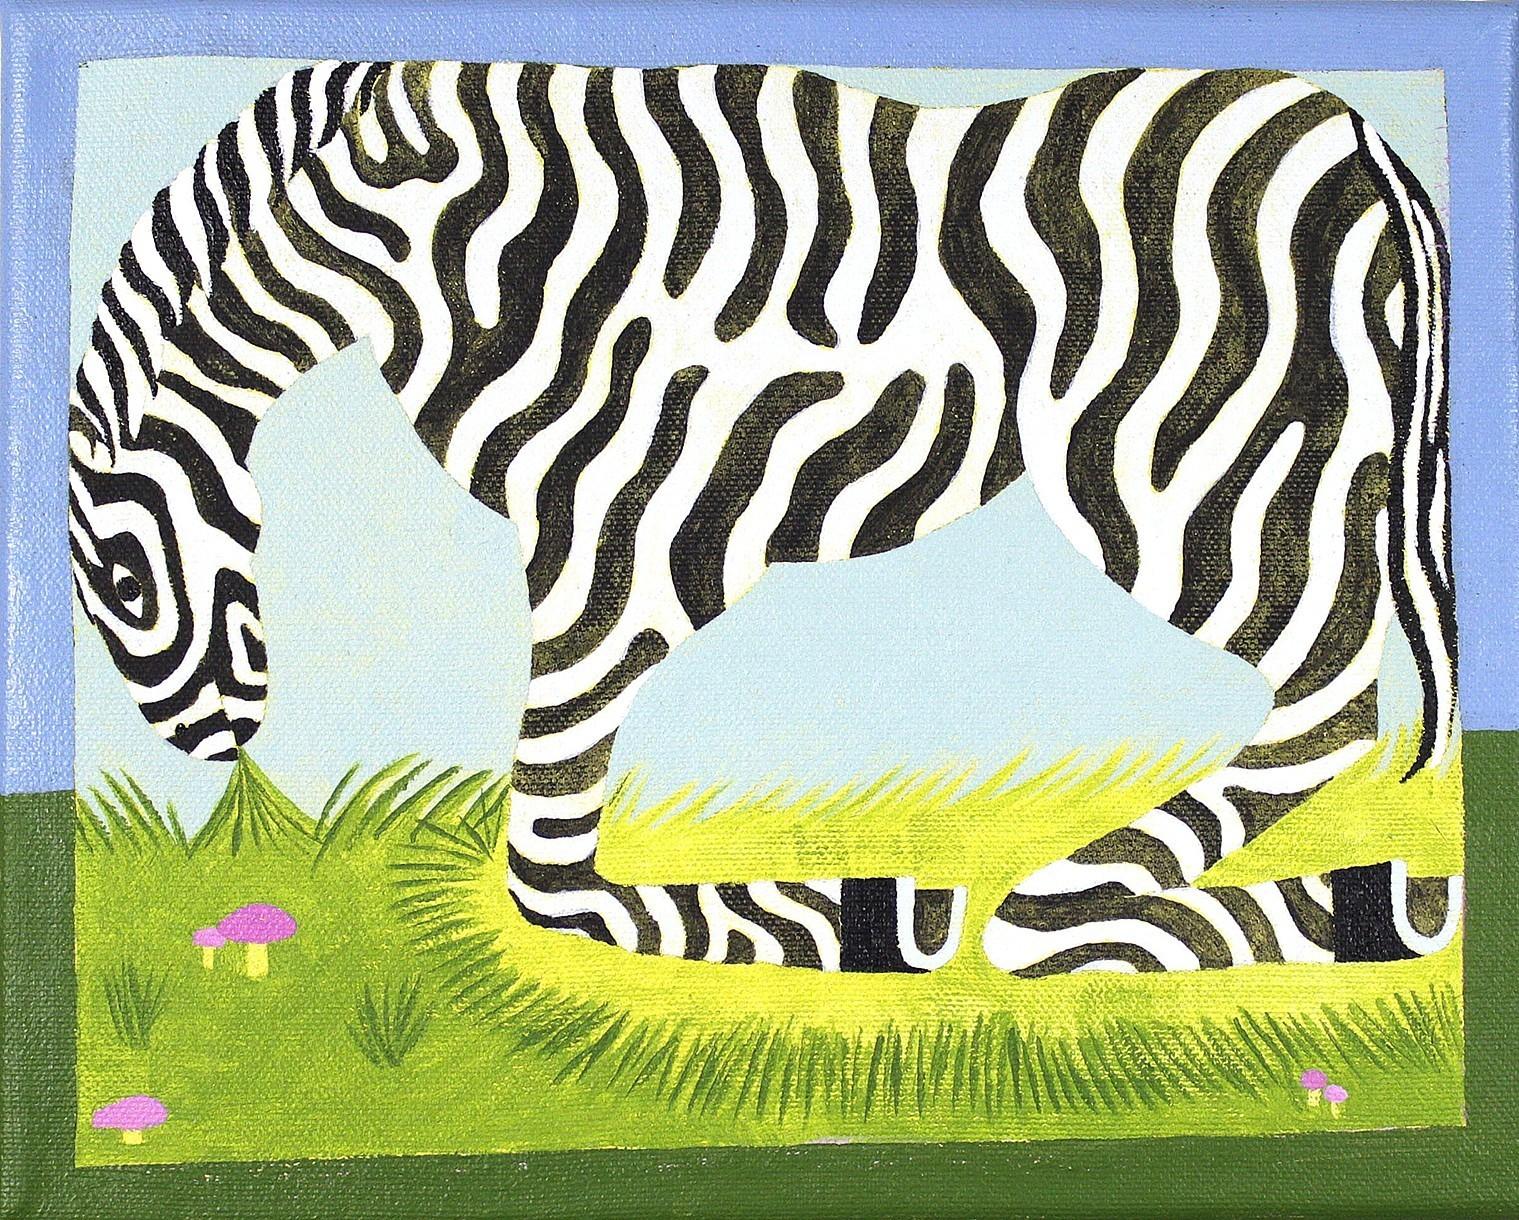 David Onri Anderson, Zebra (Tiger Horse), 2018